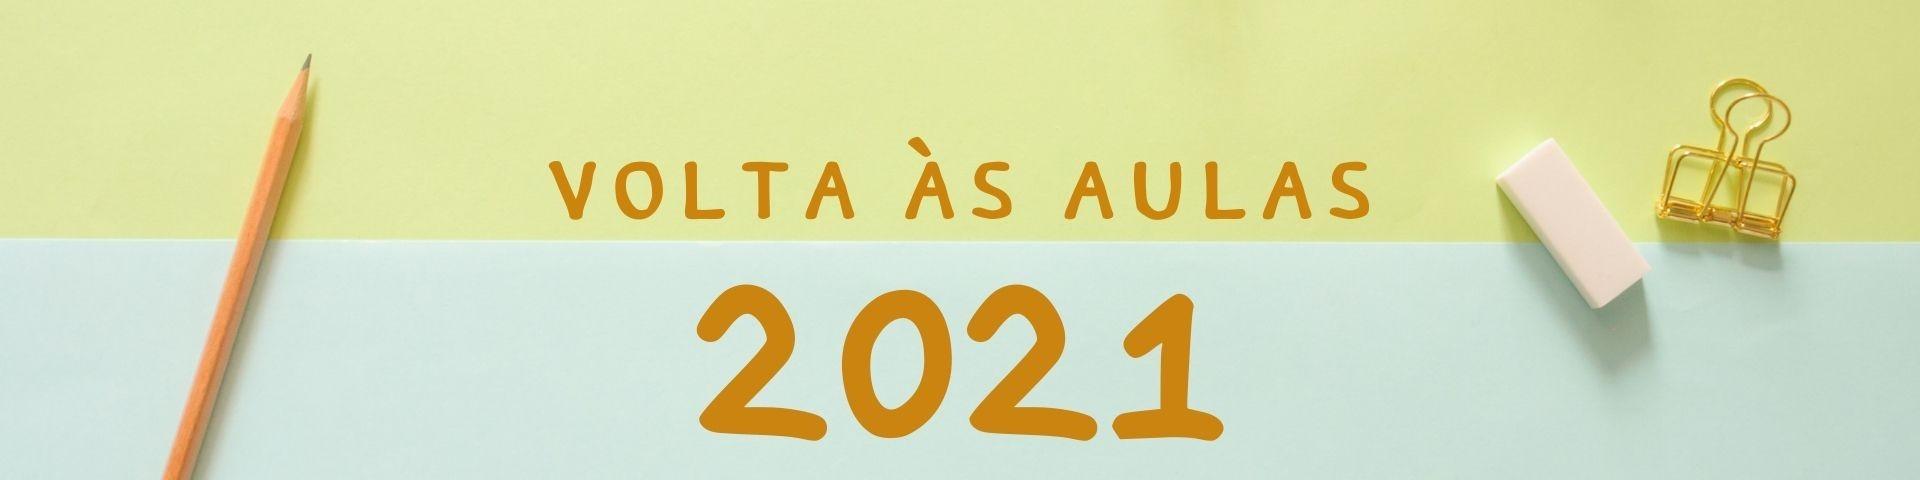 VOLTA AS AULAS 2021 2 OPCAO